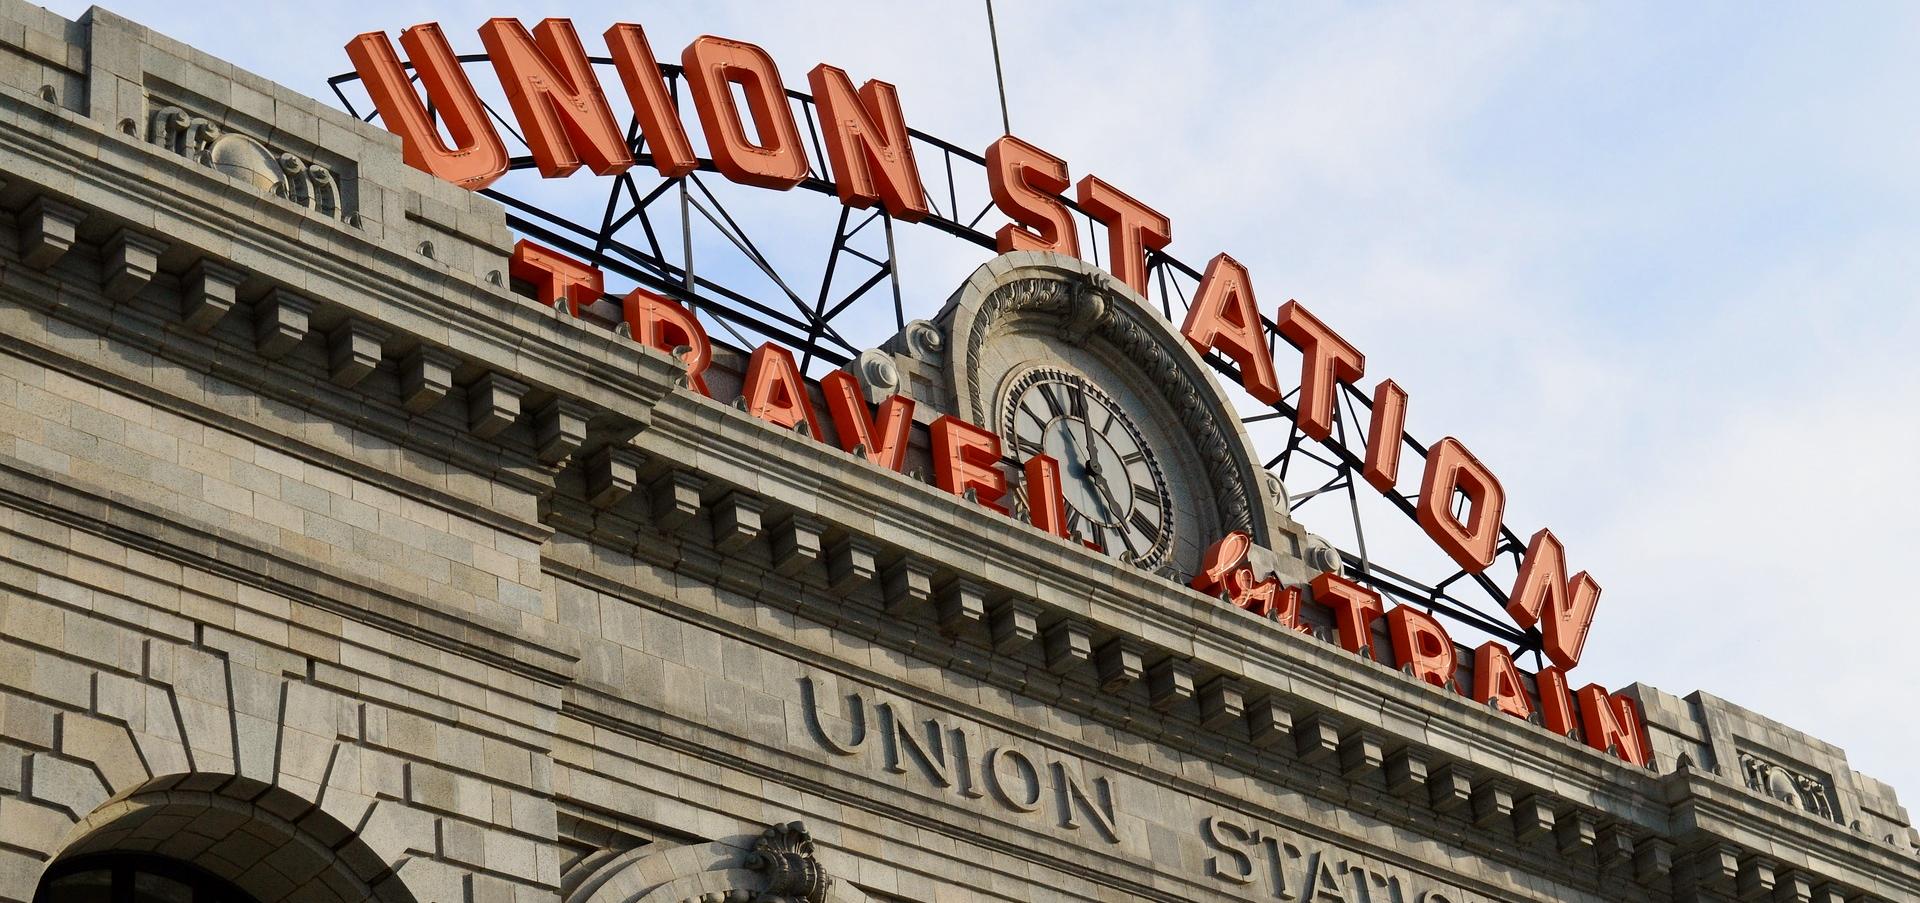 union-station-denver